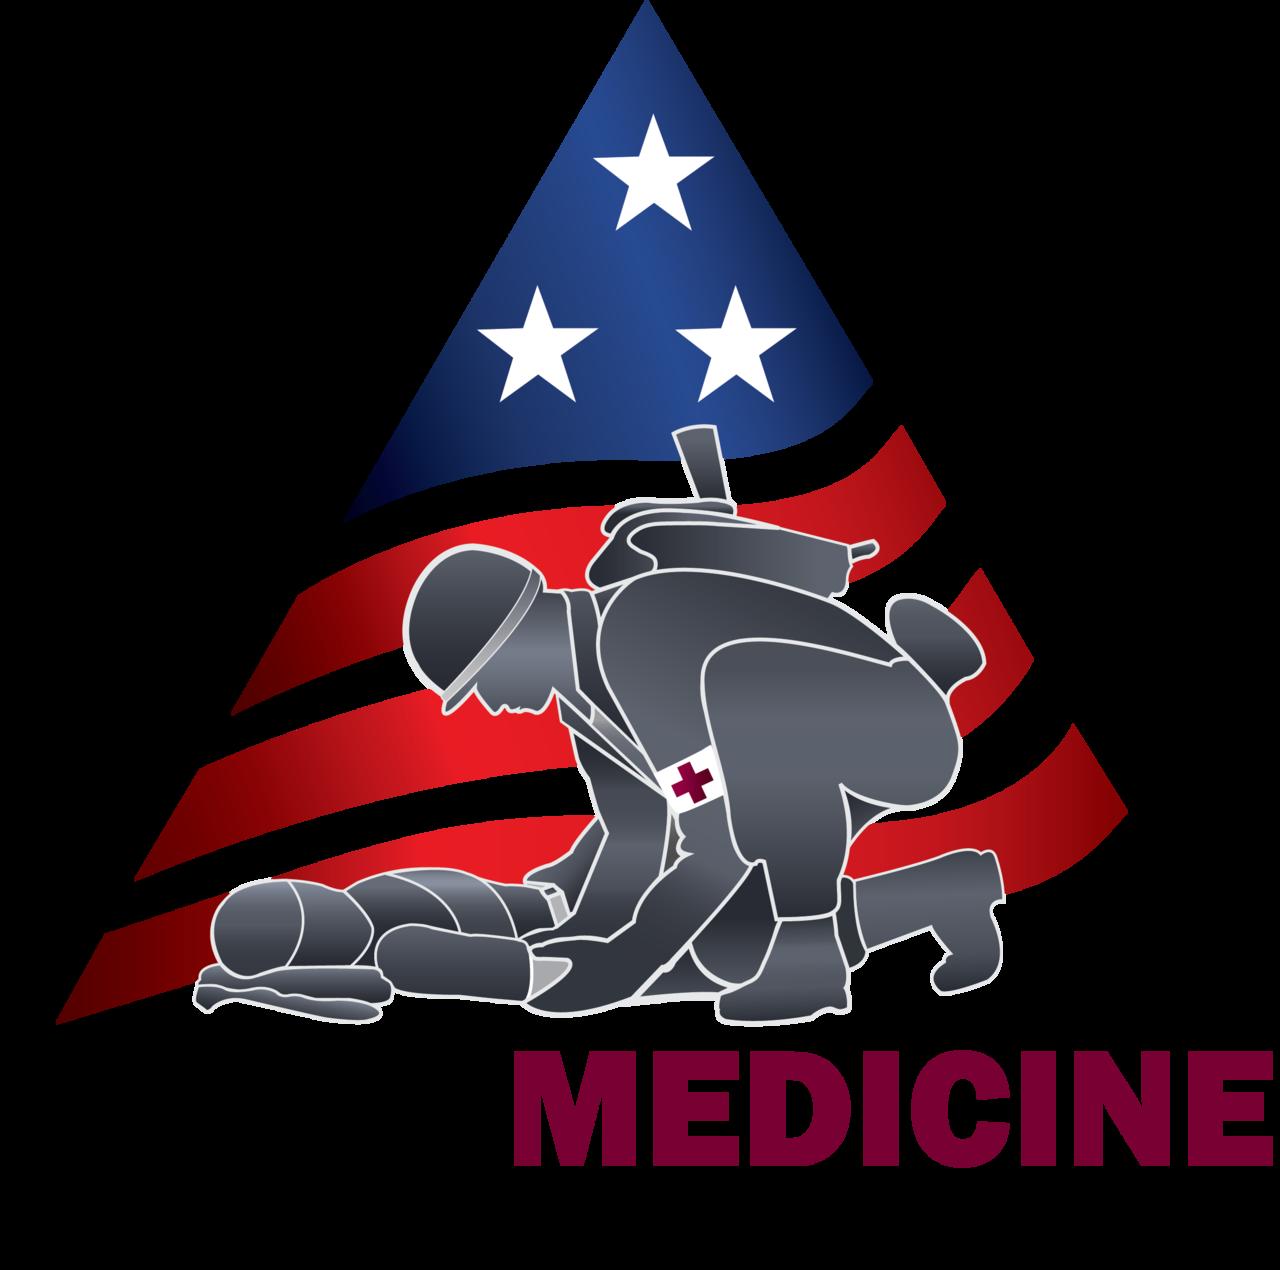 The new Army Medicine logo.